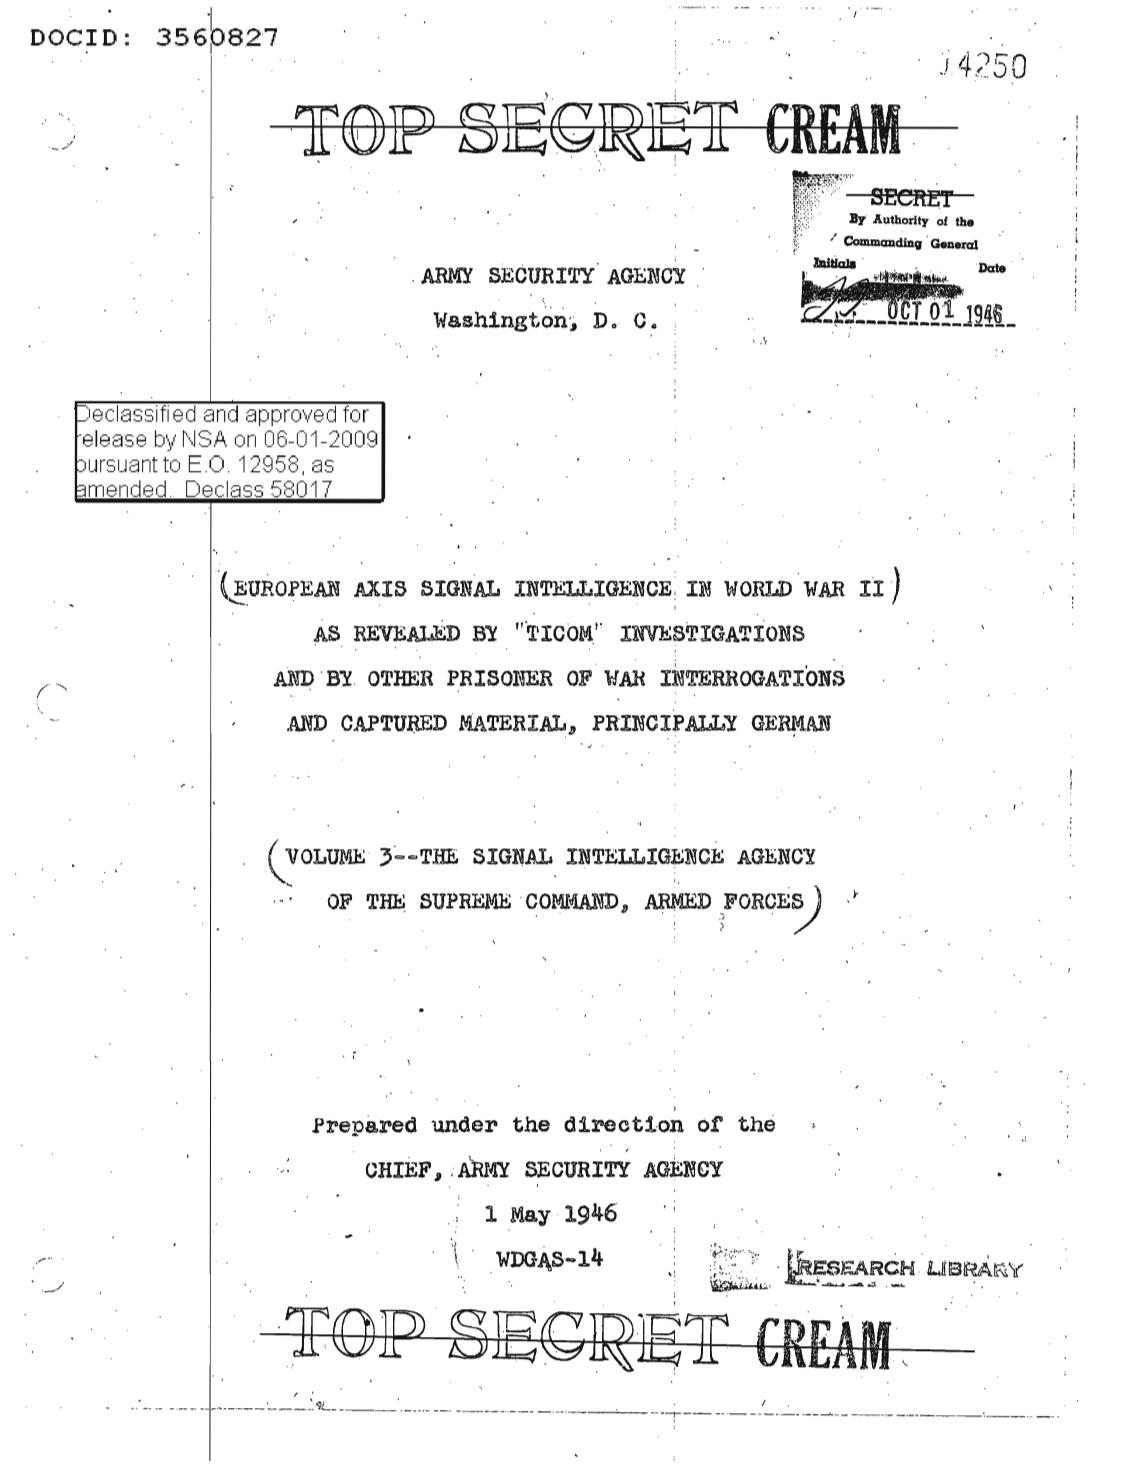 VOLUME_3_SUPREME_COMMAND_SIGINT_AGENCY.PDF